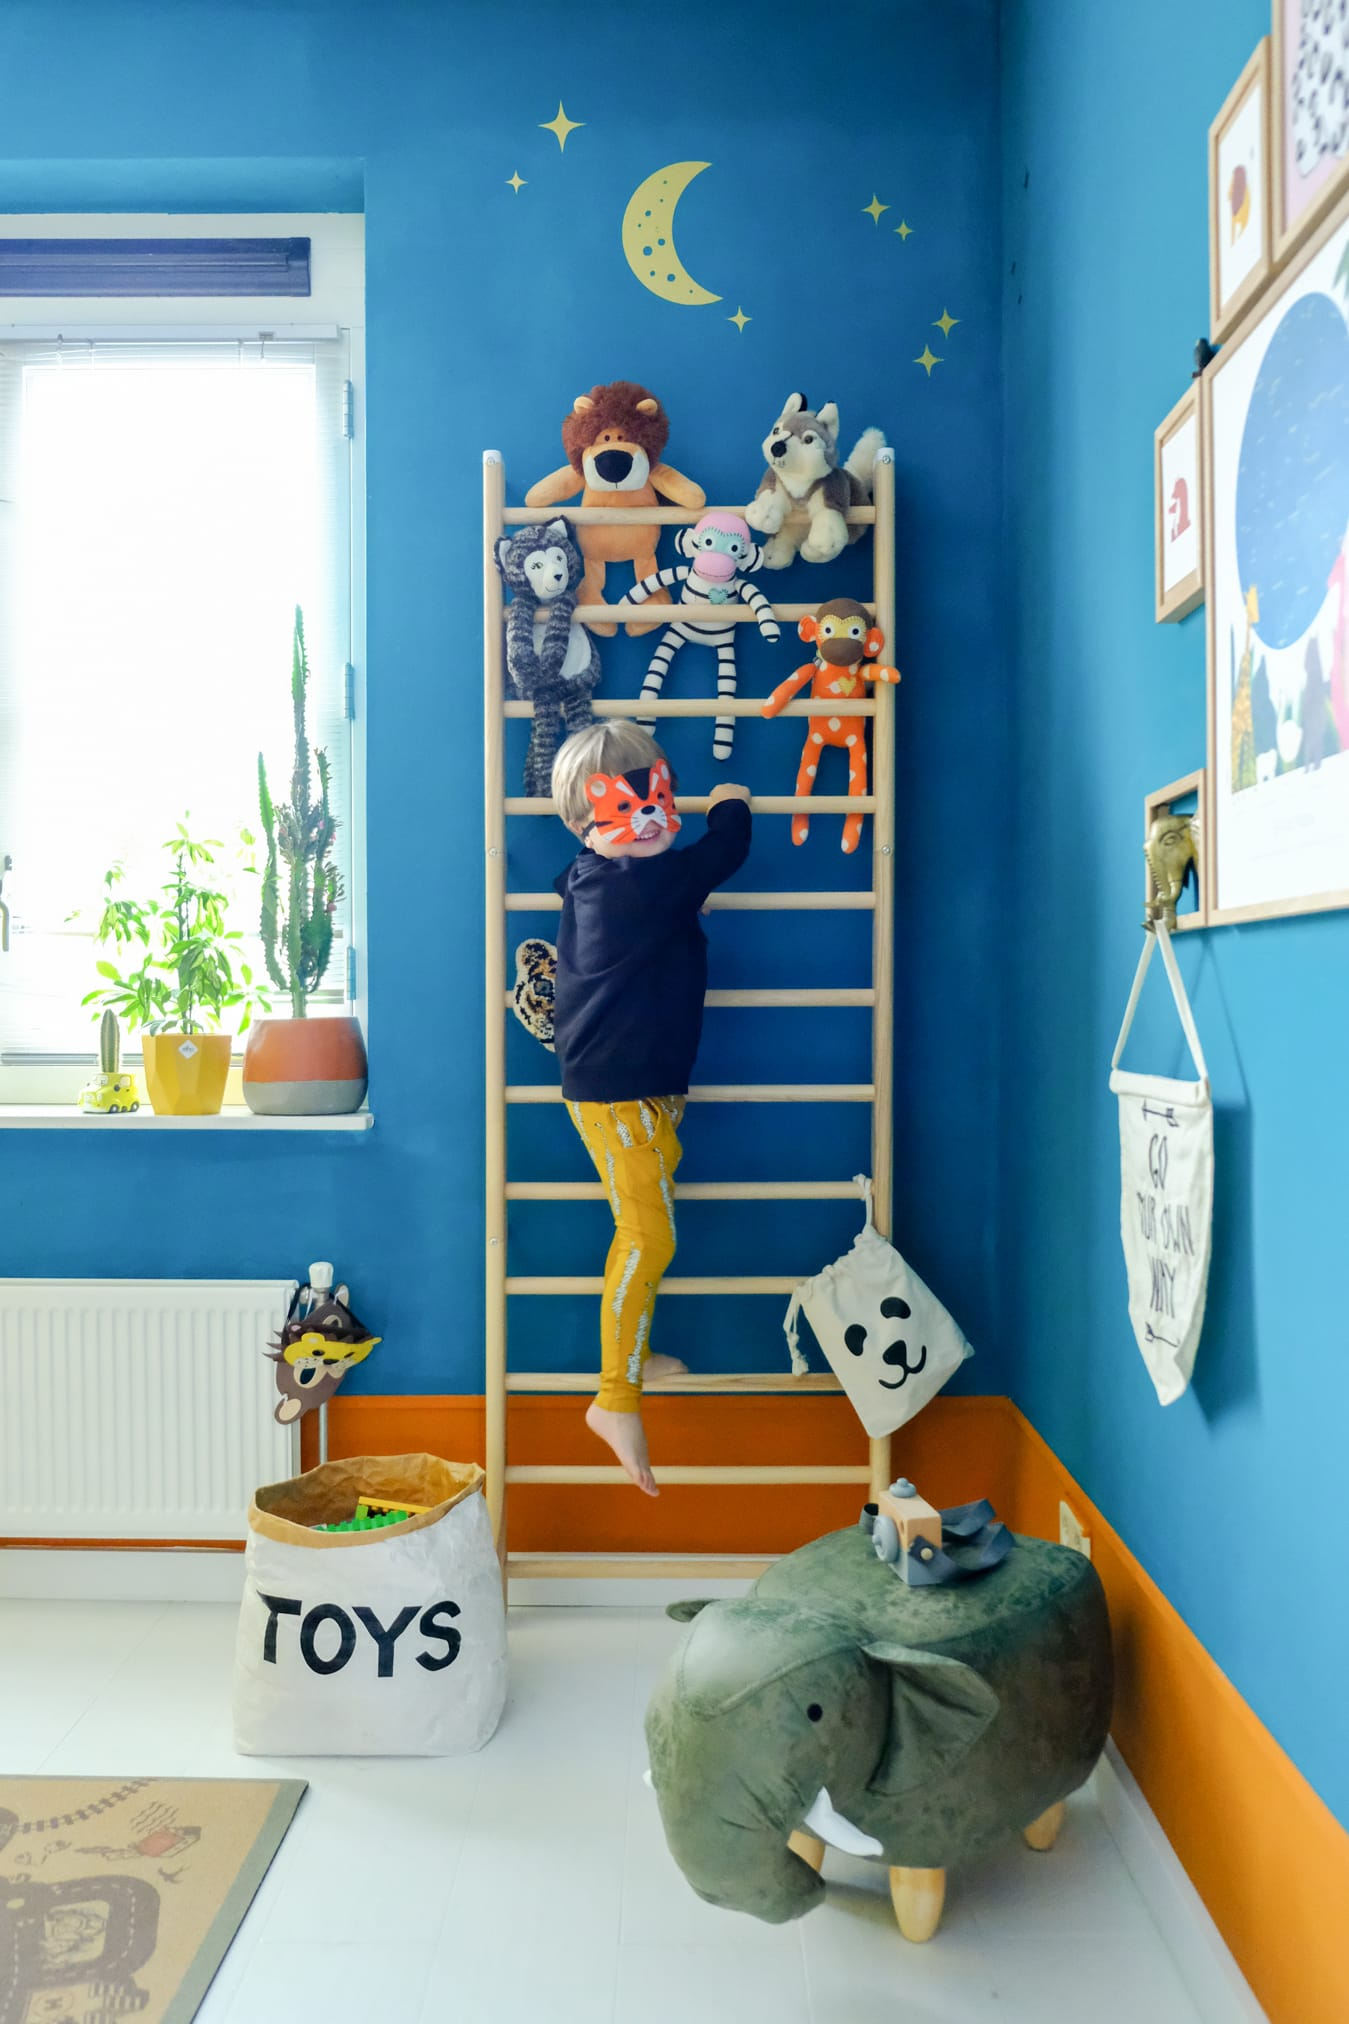 klimrek in de kinderkamer